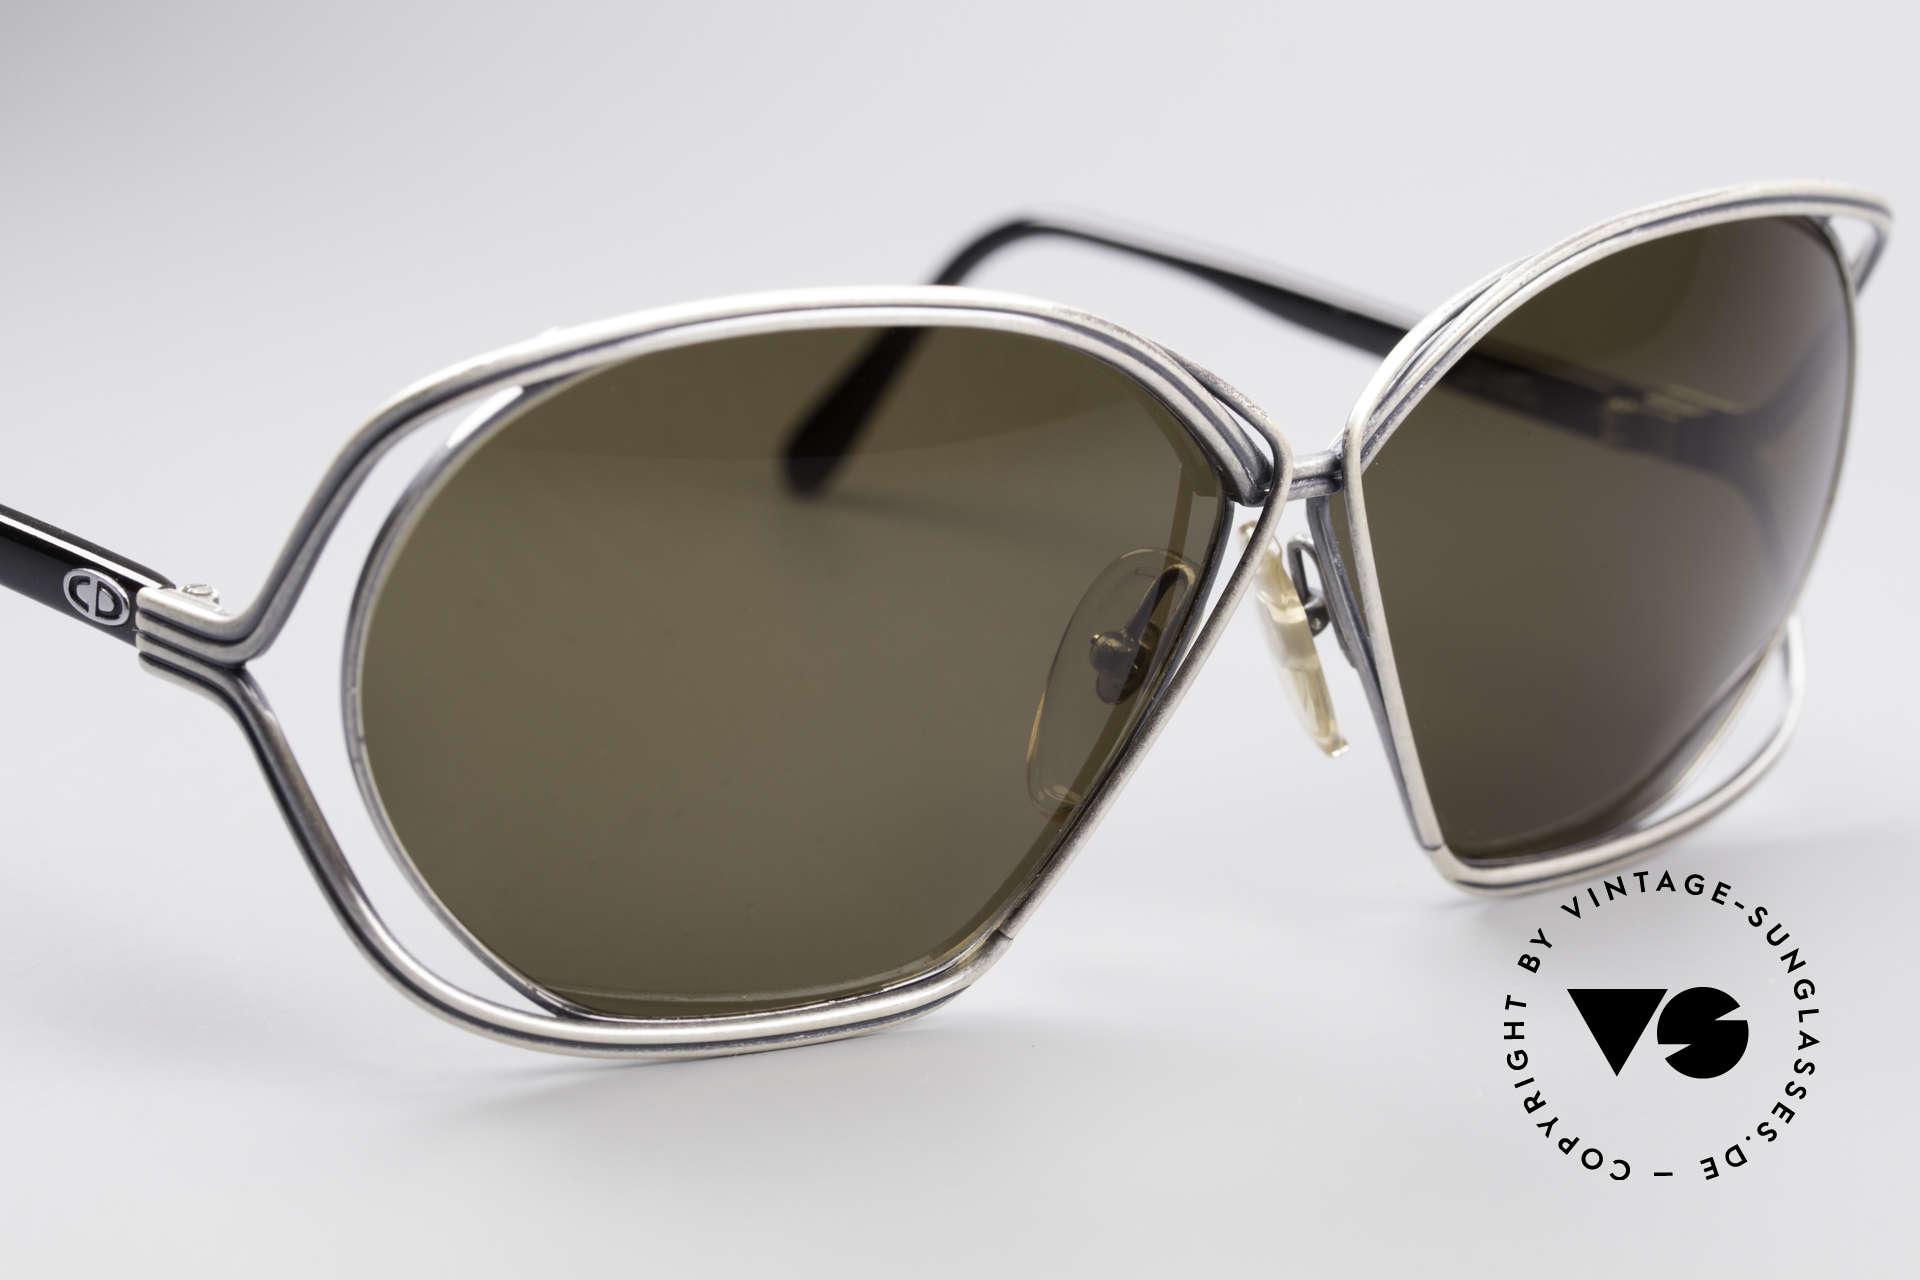 cb44ecdb65 Sunglasses Christian Dior 2499 1980  39 s Ladies Sunglasses